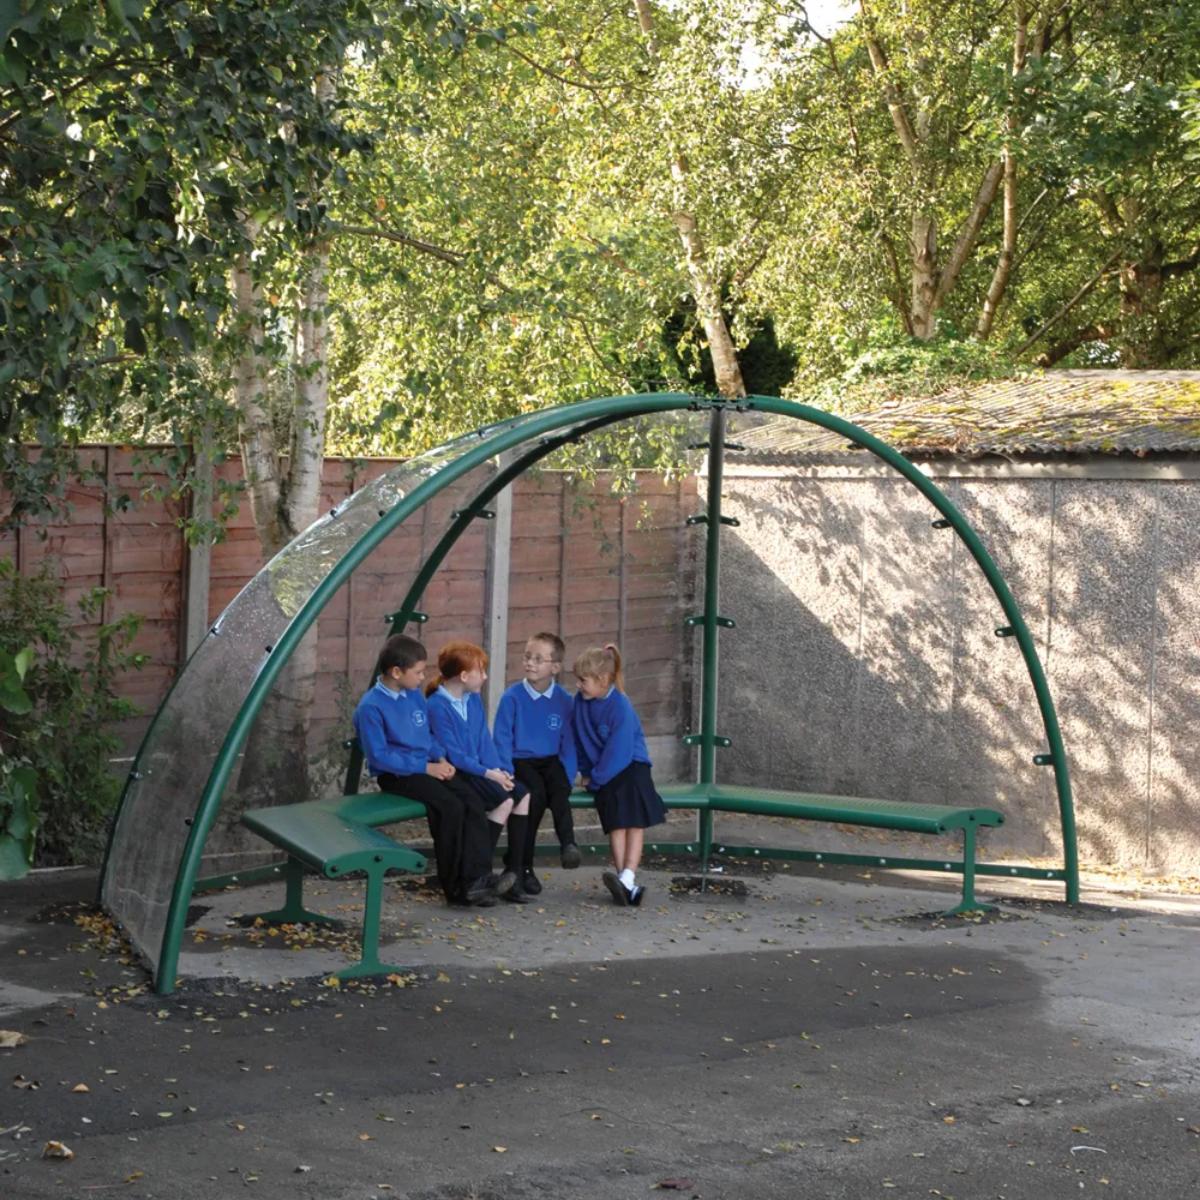 Tewkesbury Recreation Shelter